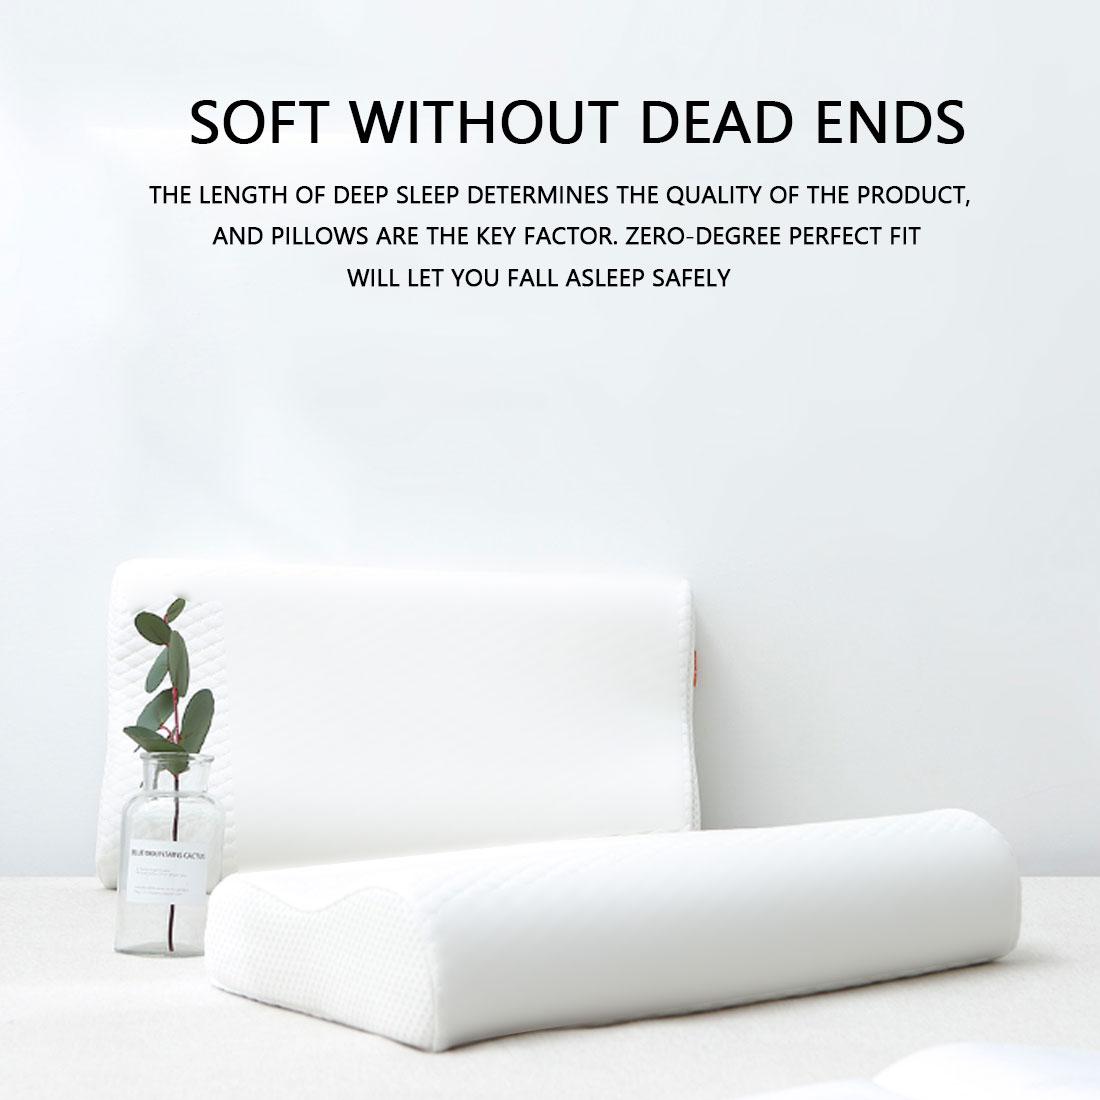 Sleeping Memory Foam Orthopedic Pillow 50*30cm/ 60*35cm Butterfly Shaped Memory Foam Bedding Pillows For Health Care